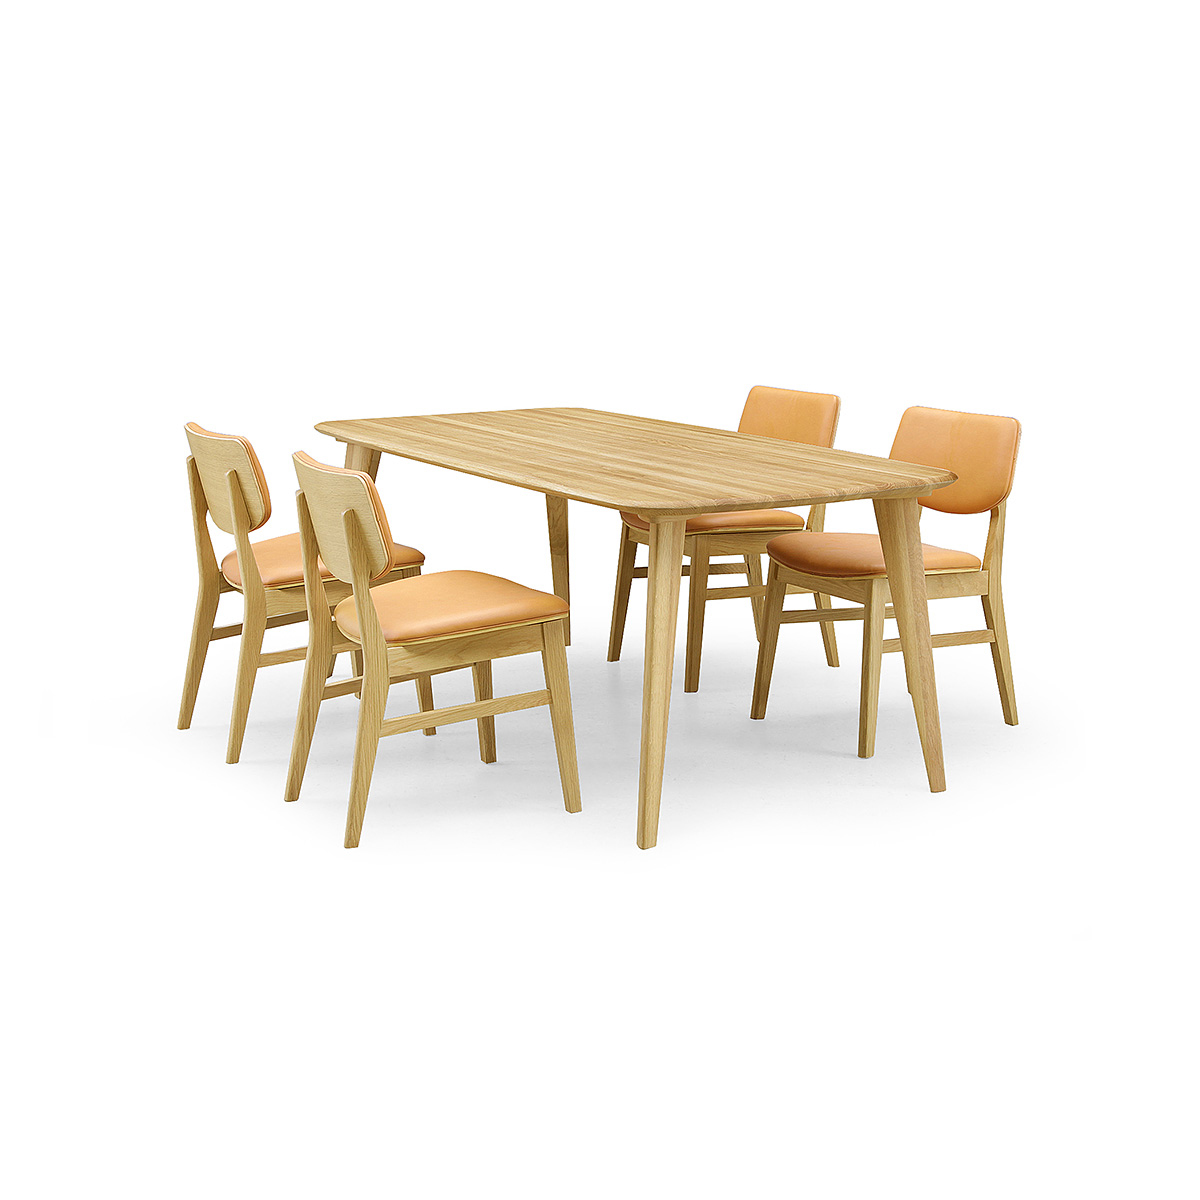 36%OFF [ダイニング5点] GREEN home style YUZU DINING TABLE B180 + CHAIR E (グリーン ホームスタイル ユズ ダイニングテーブル B180 チェア E) ダイニングセット 岩倉 榮利 (テーブル幅180cm, オーク材)【同梱】